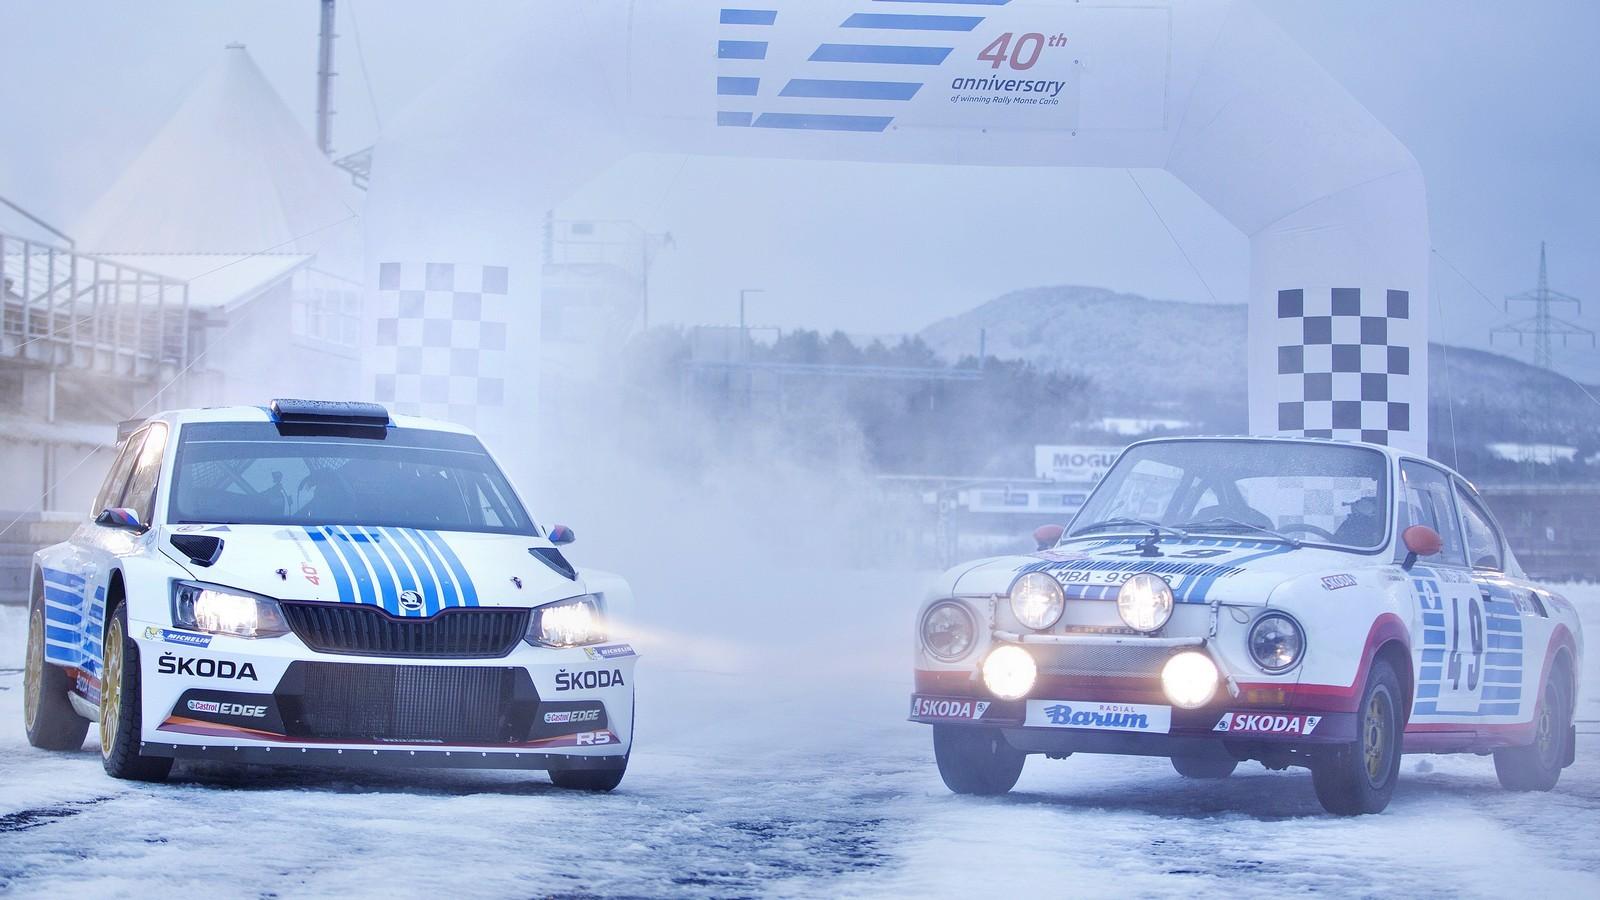 170116-KODA-marks-40th-anniversary-of-legendary-win-at-the-Rally-Monte-Carlo-2_cr[1]